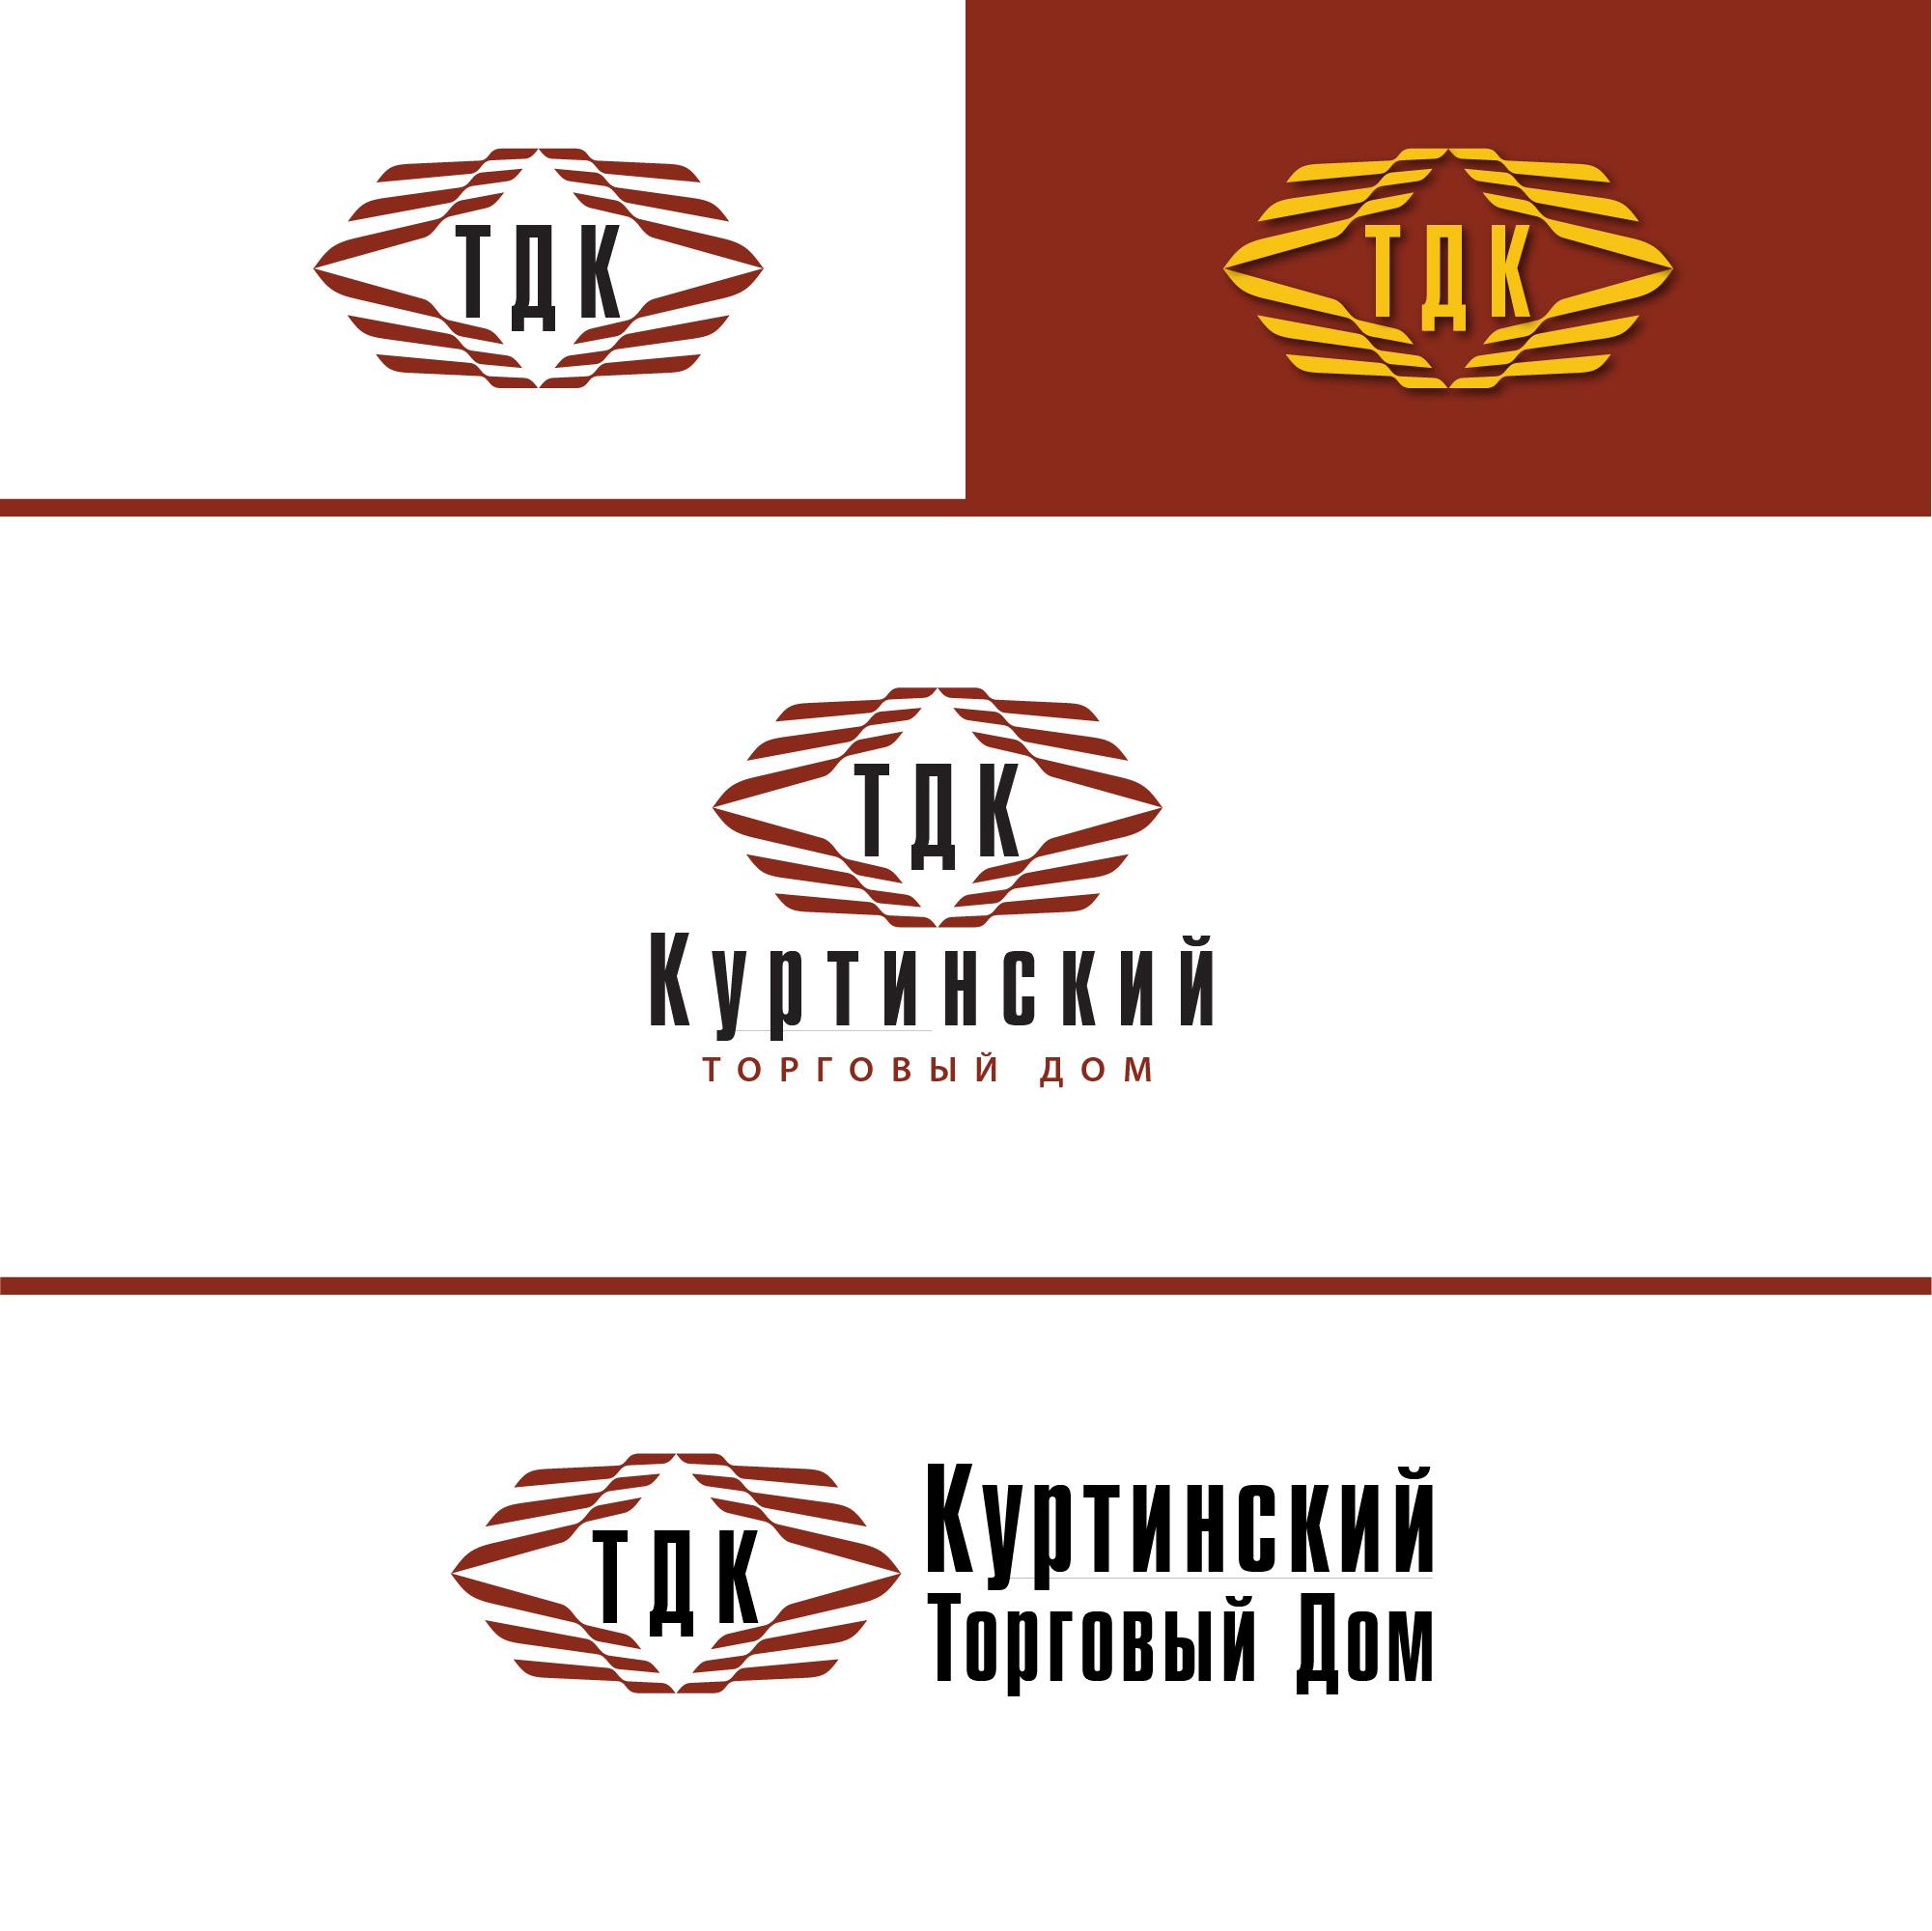 Логотип для камнедобывающей компании фото f_6365b9934874ee09.jpg